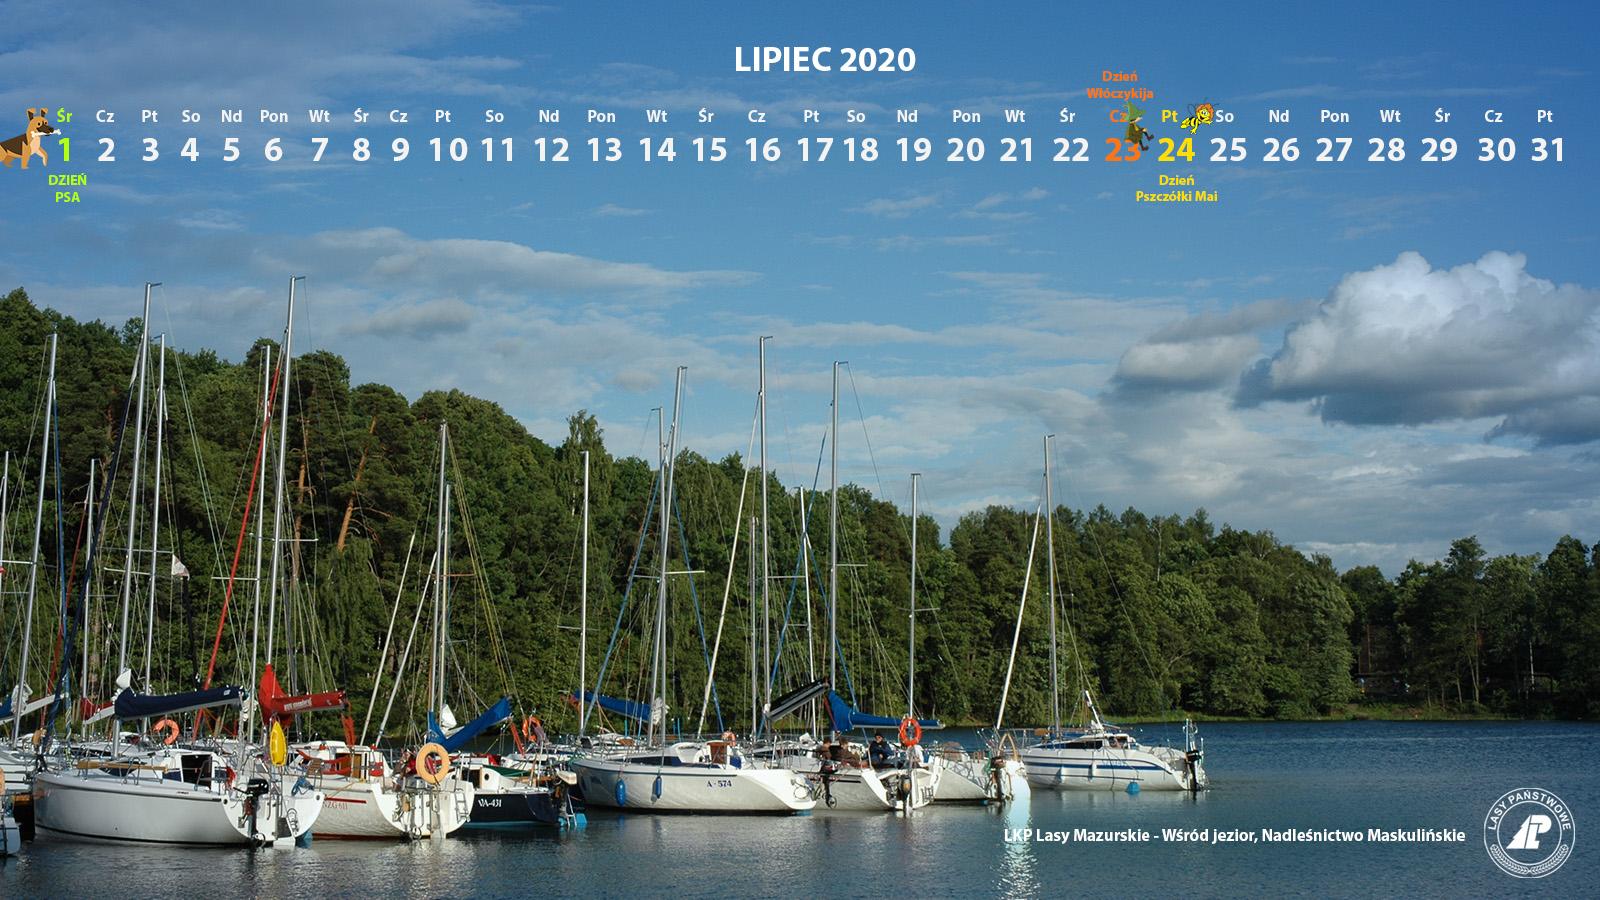 Kalendarz_lipiec_2020_1600x900[1].jpg